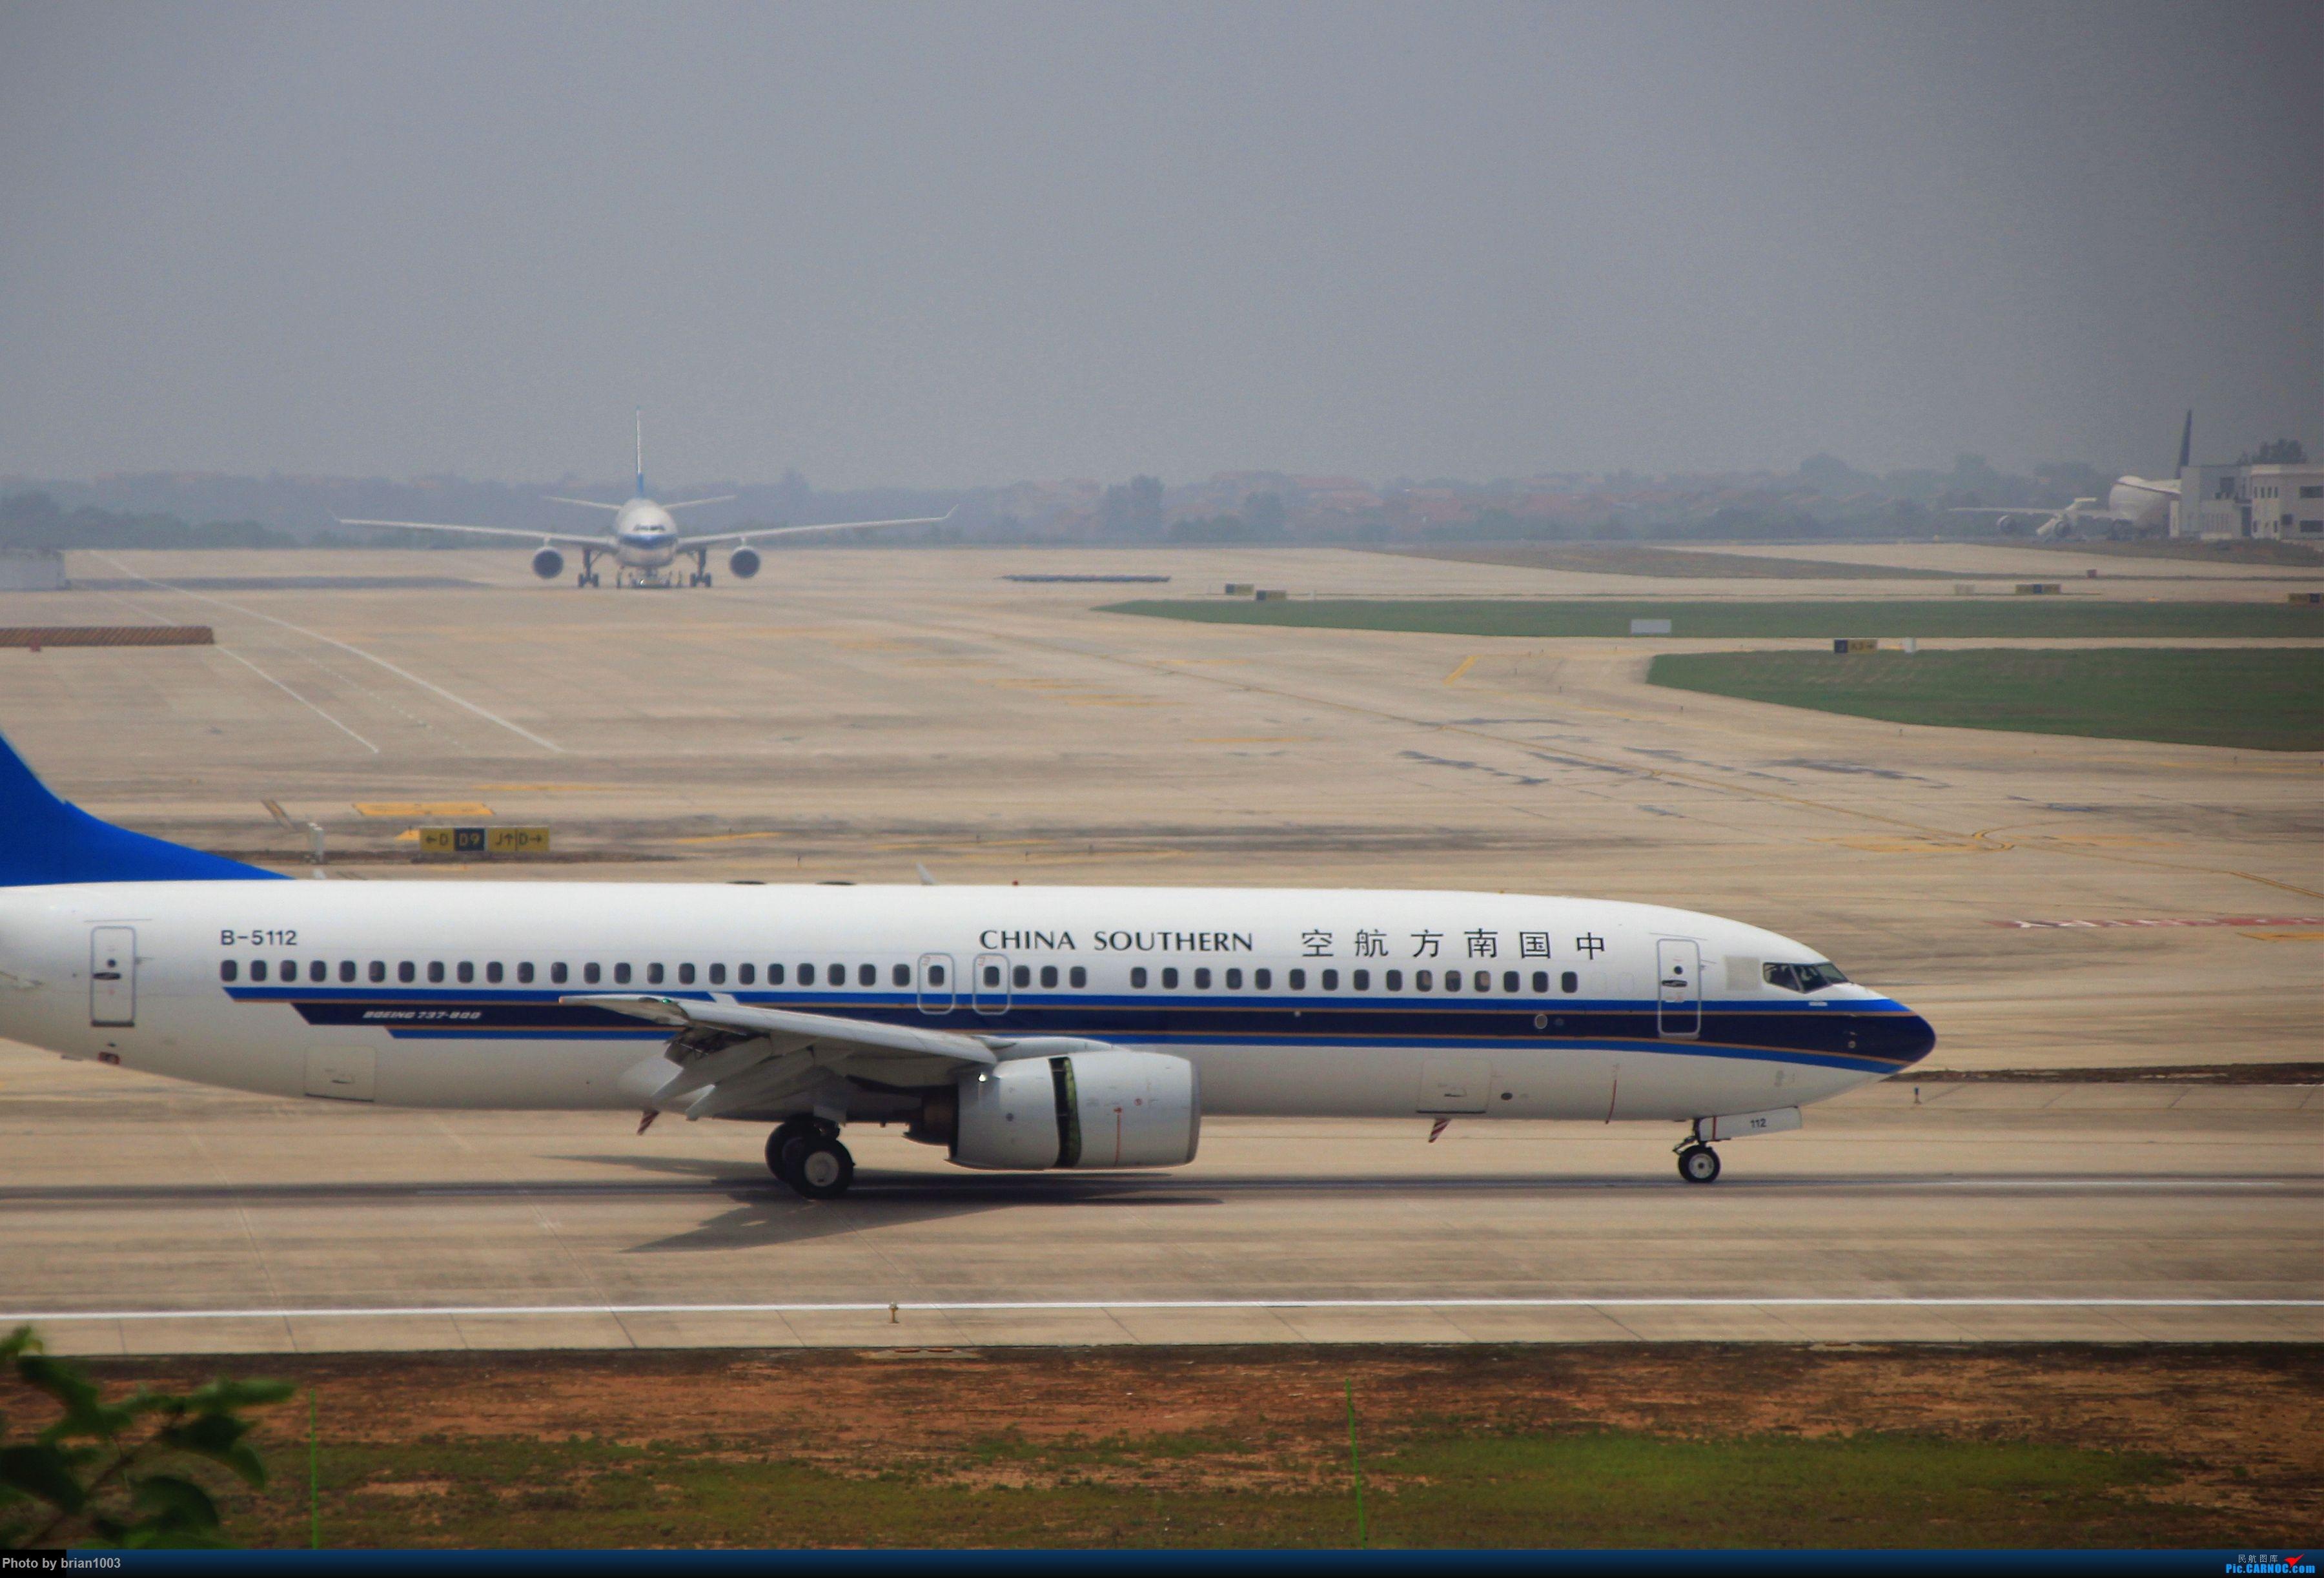 Re:[原创]WUH武汉天河机场拍机之二跑最后忙碌时 BOEING 737-800 B-5112 中国武汉天河国际机场